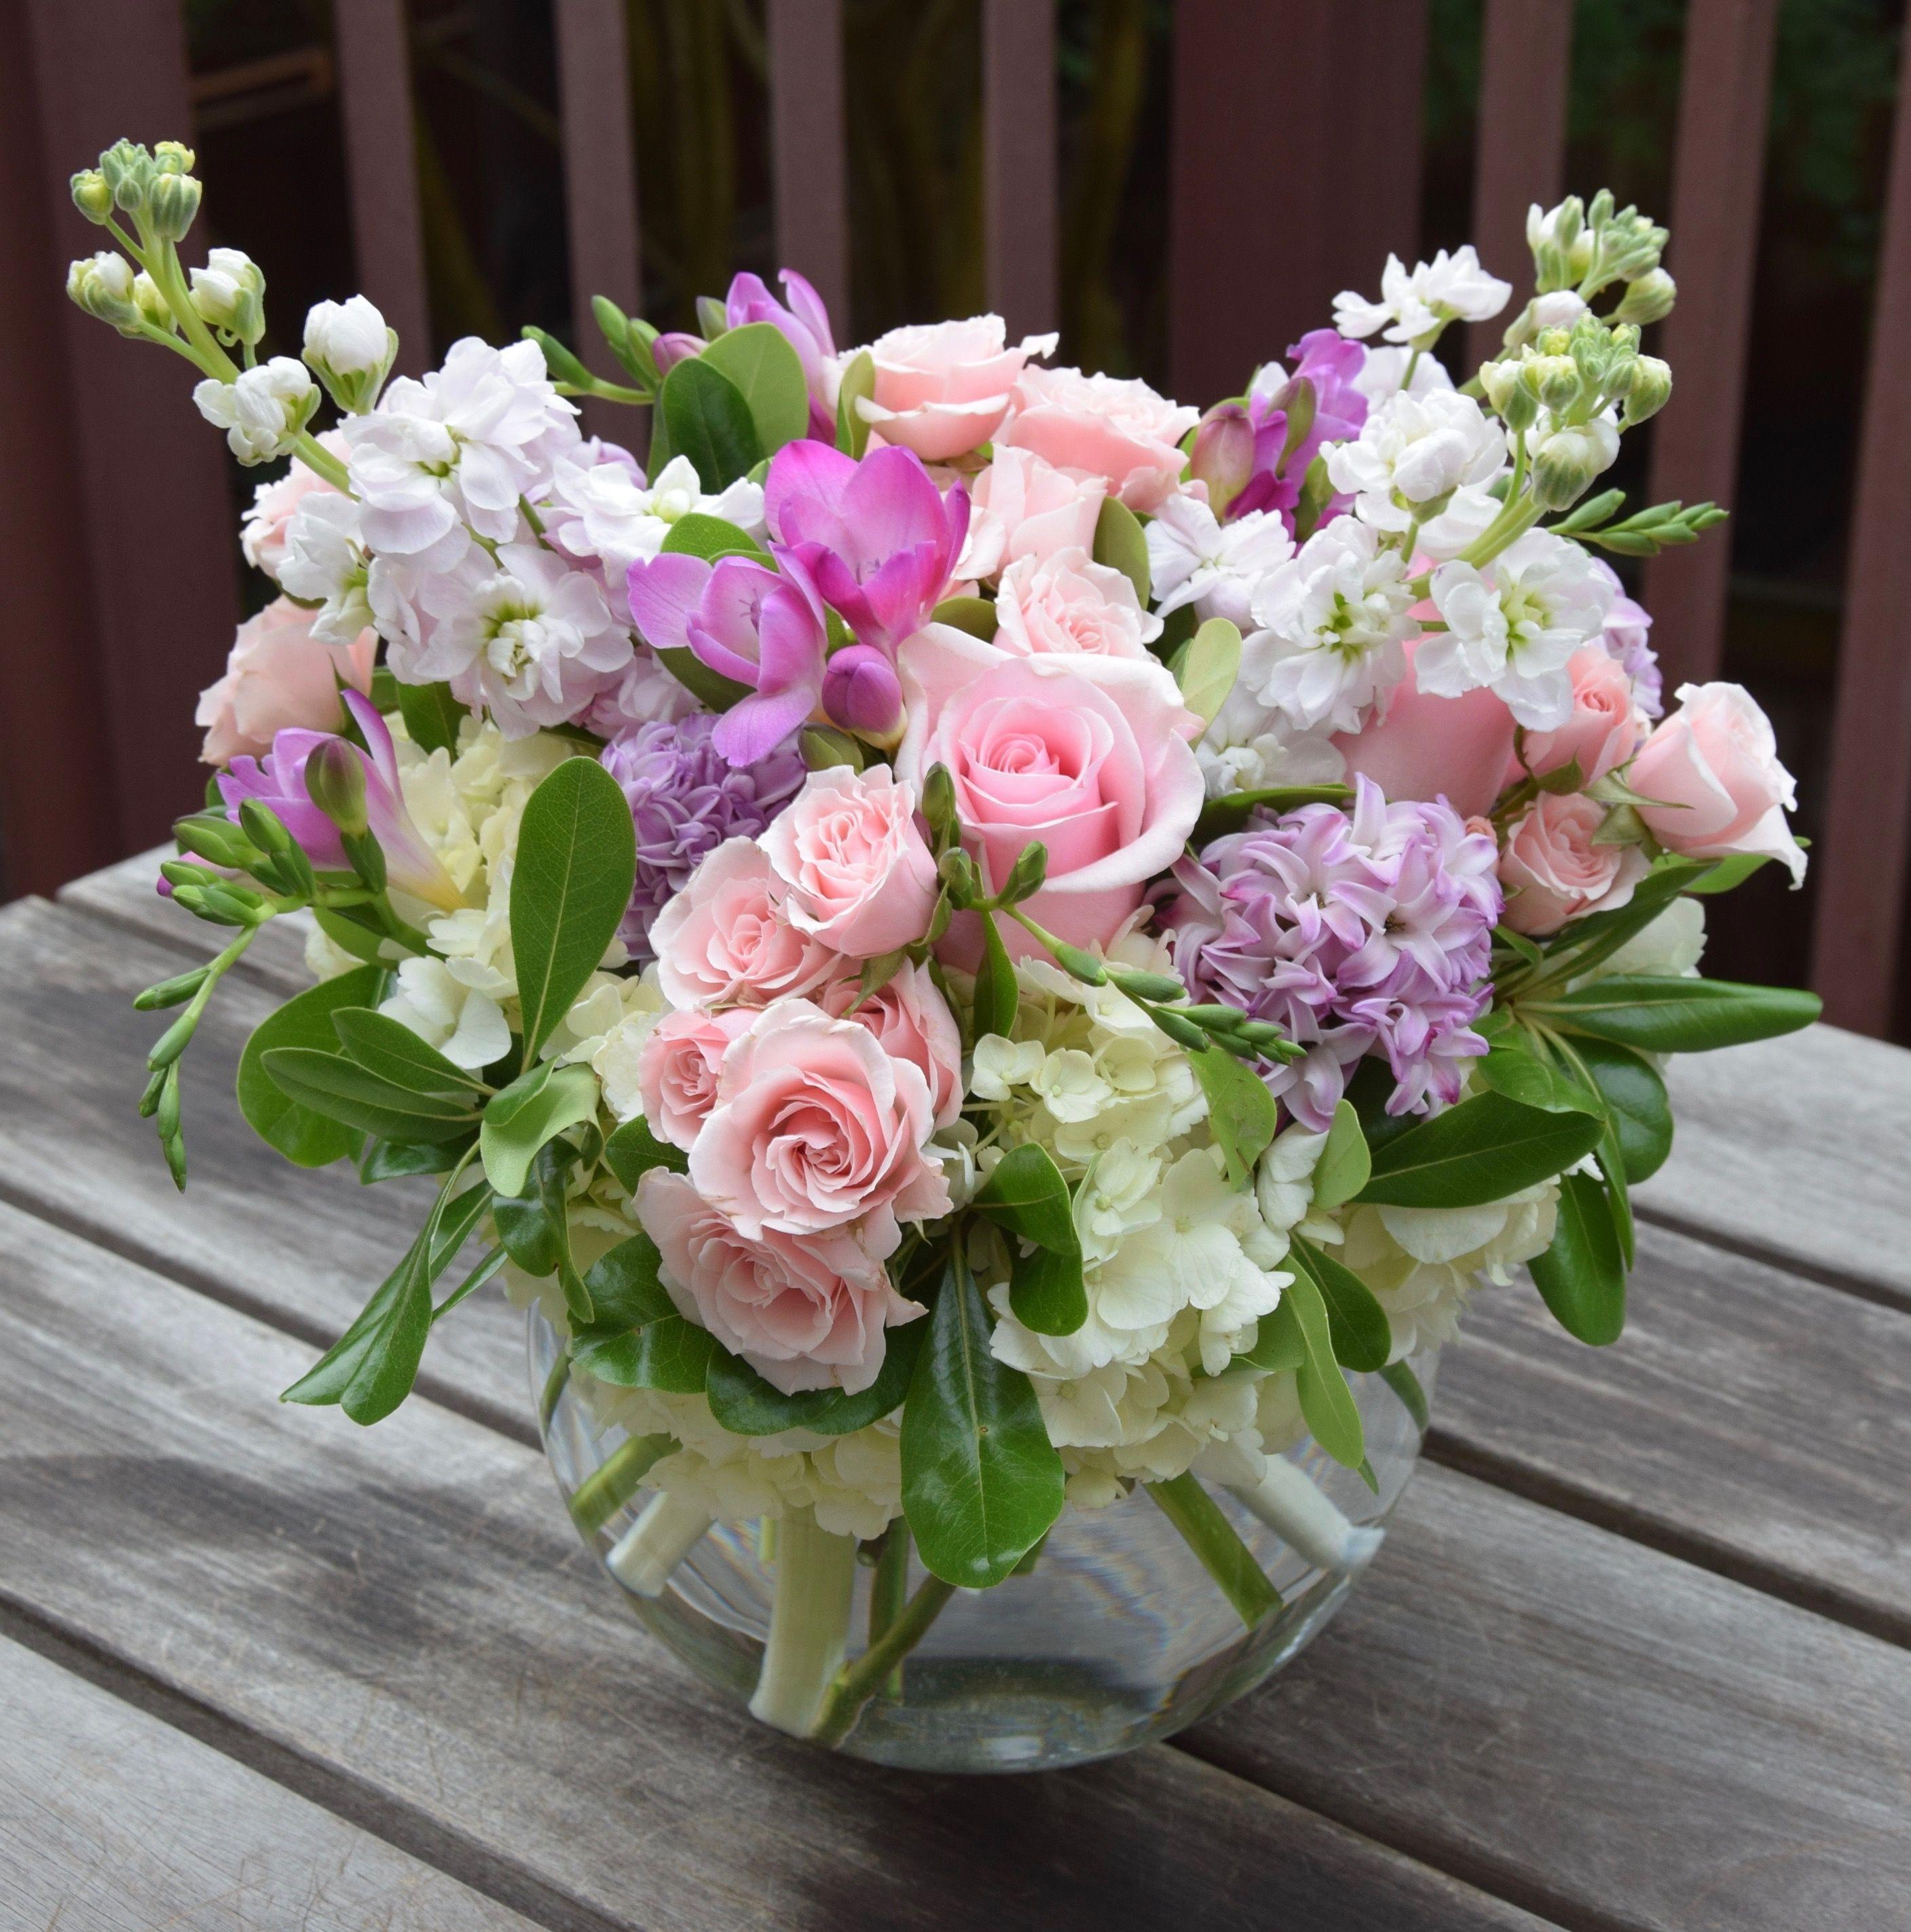 Fragrant Flower Arrangement For Mother S Day With Hydrangea Freesia Stock Spr Flower Vase Arrangements Fresh Flowers Arrangements Flower Arrangements Simple